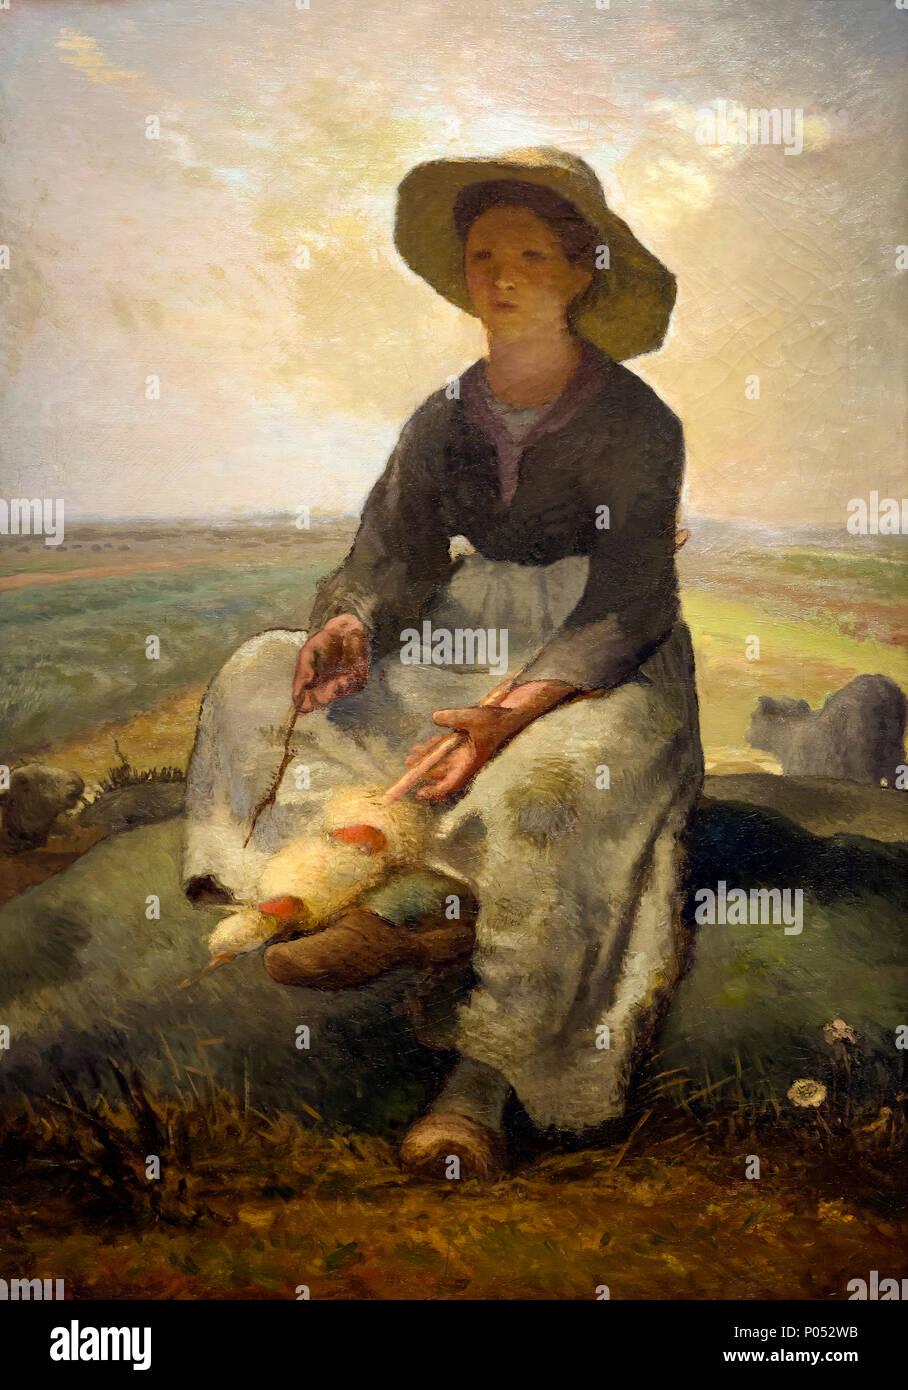 Young Shepherdess, Jean-Francois Millet, circa 1870-1873, Museum of Fine Arts, Boston, Mass, USA, North America - Stock Image